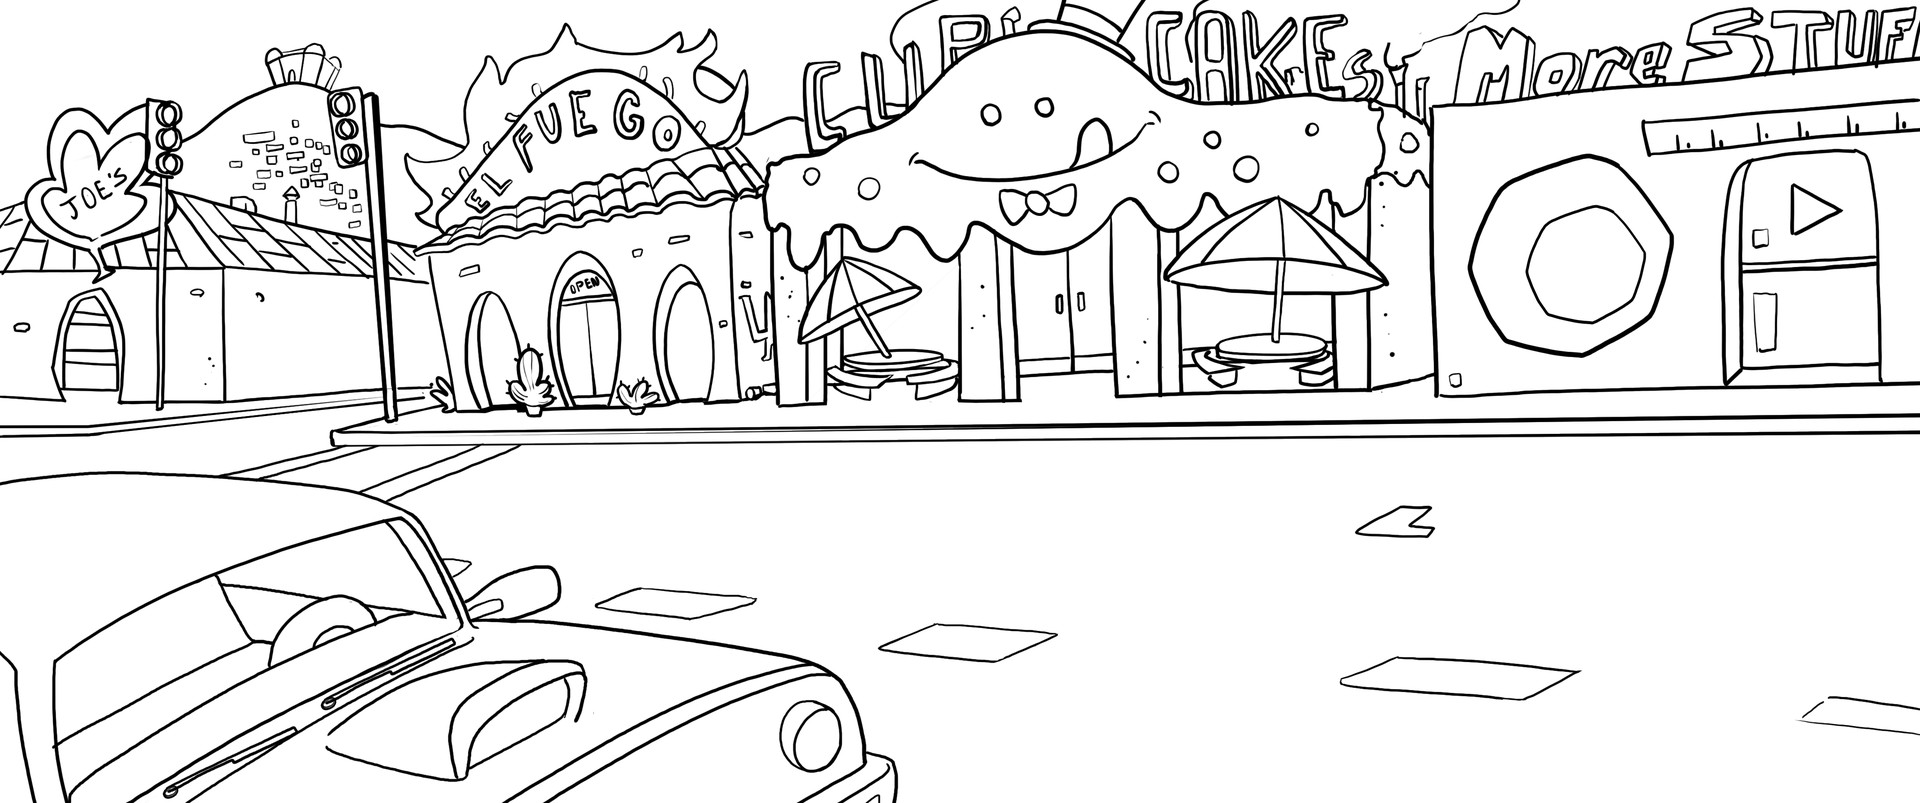 Albert carranza mrc streetviewdrawing2